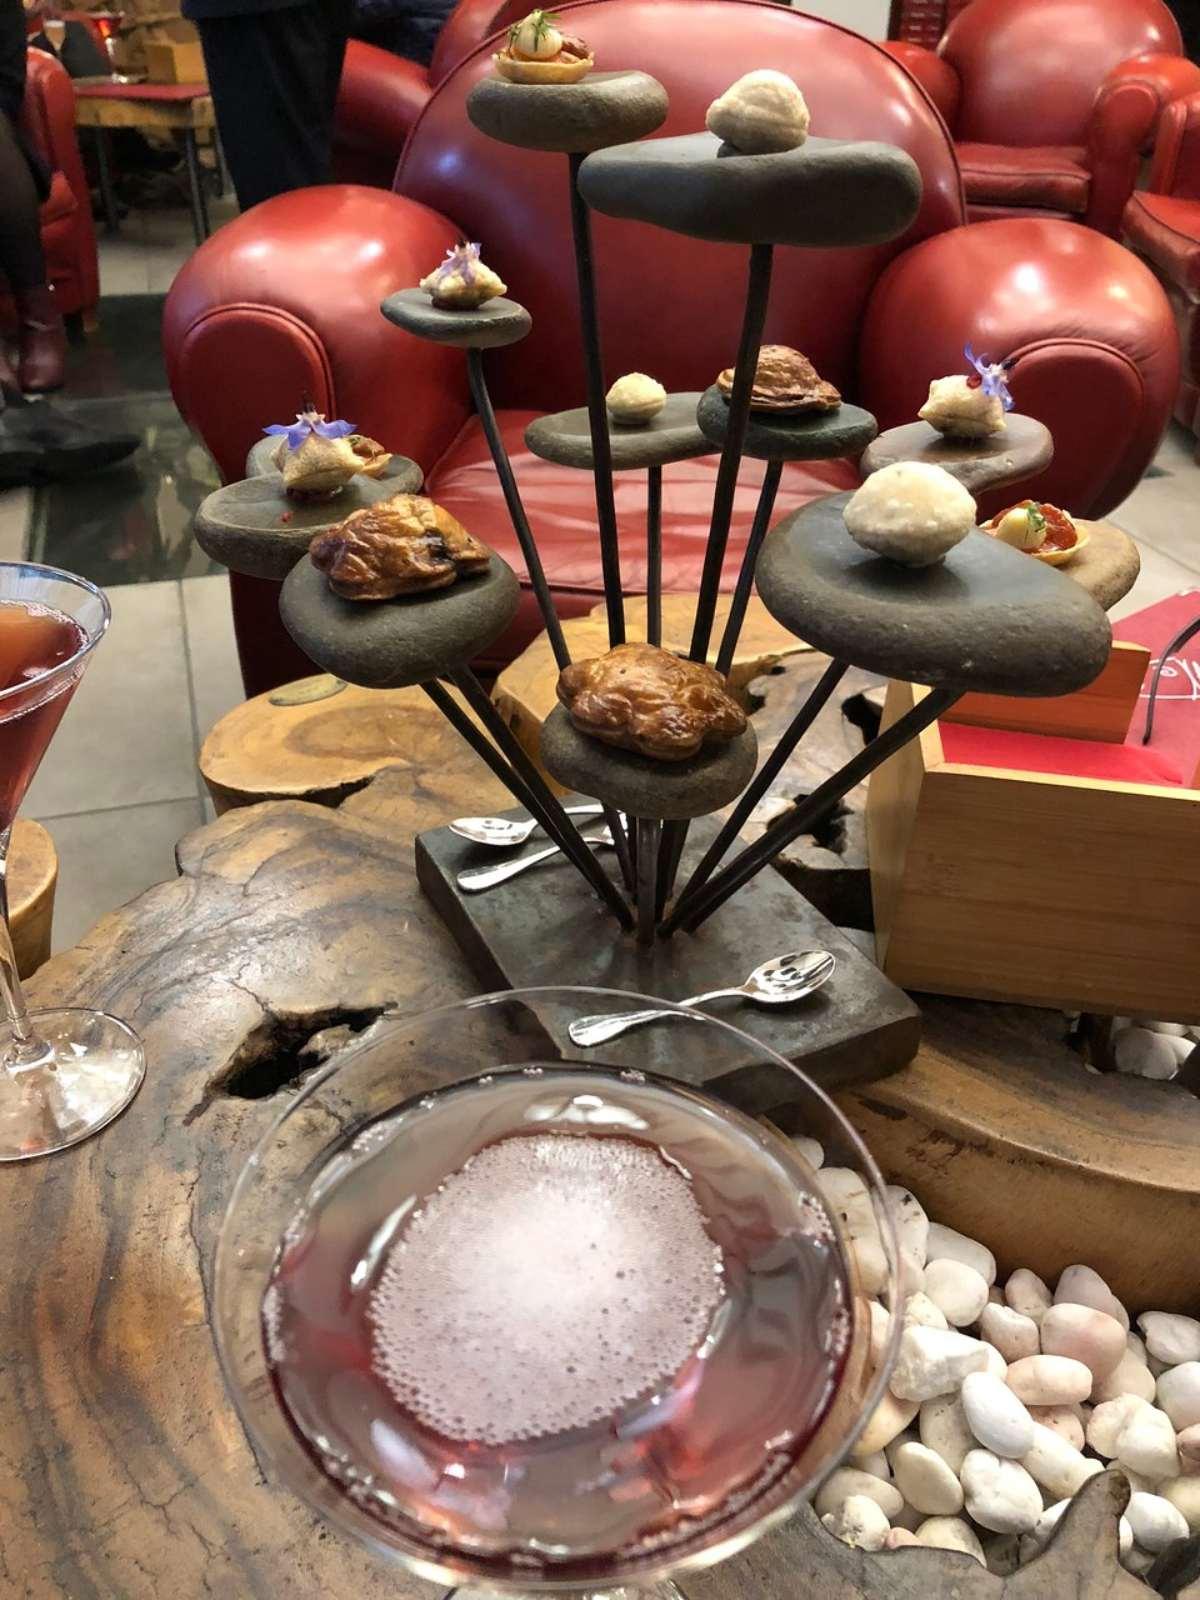 Auberge du Vieux Puits καλύτερο εστιατόριο 2020 παράξενο πιάτο